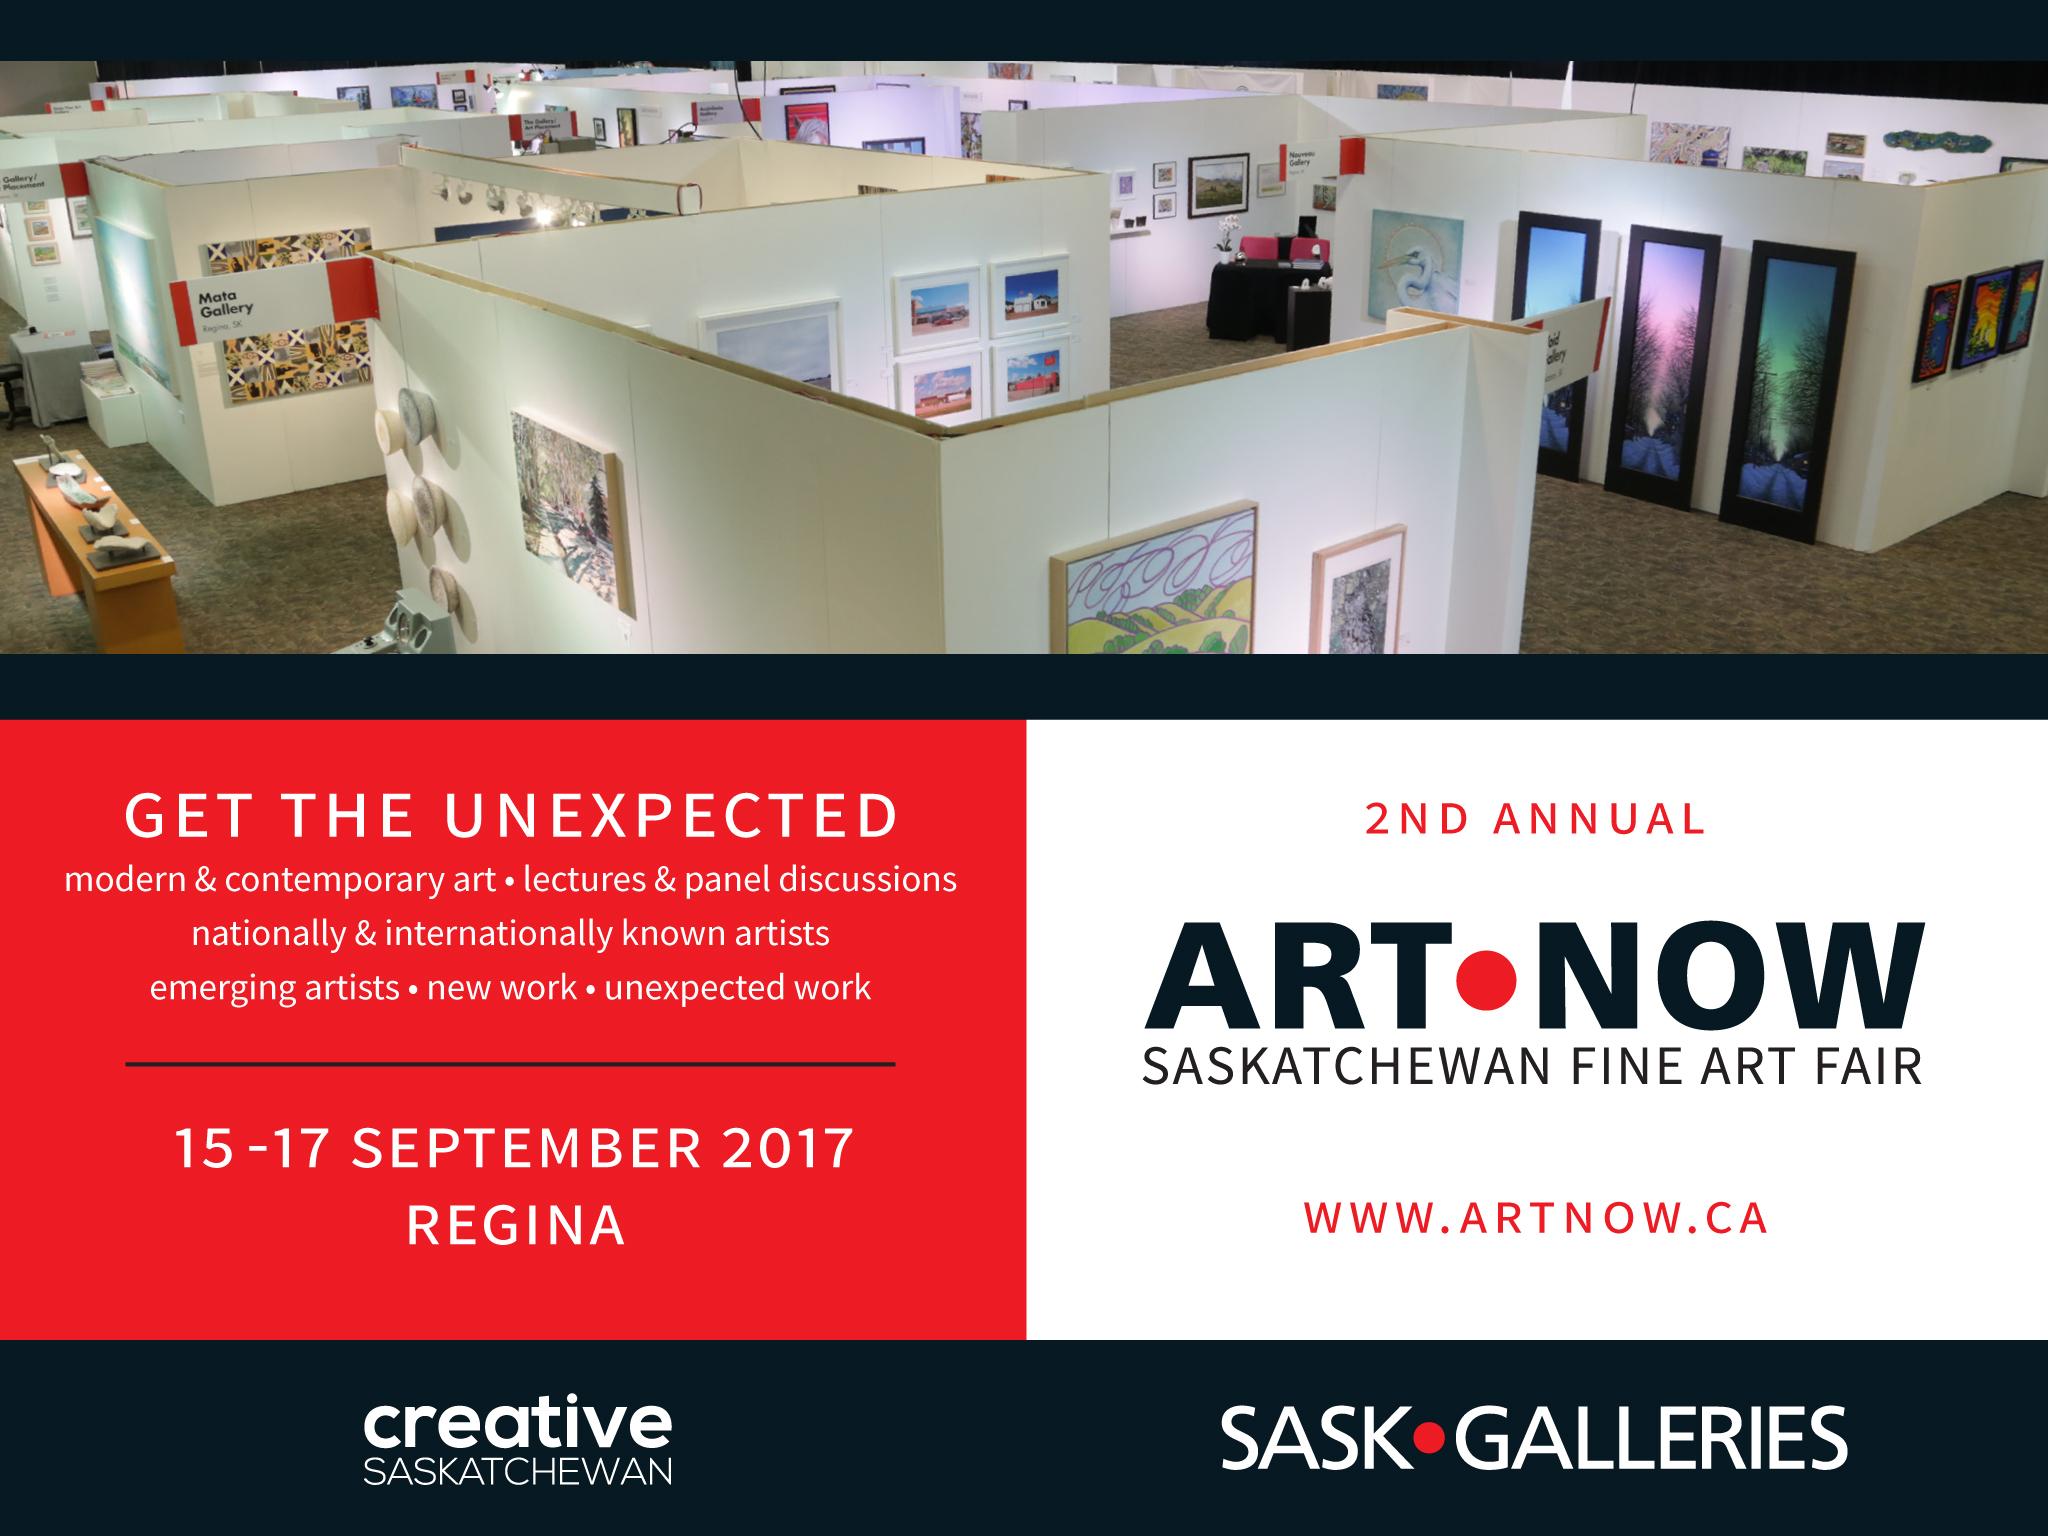 SG-125 ArtNow-GalleriesWest-large ad-final.jpg